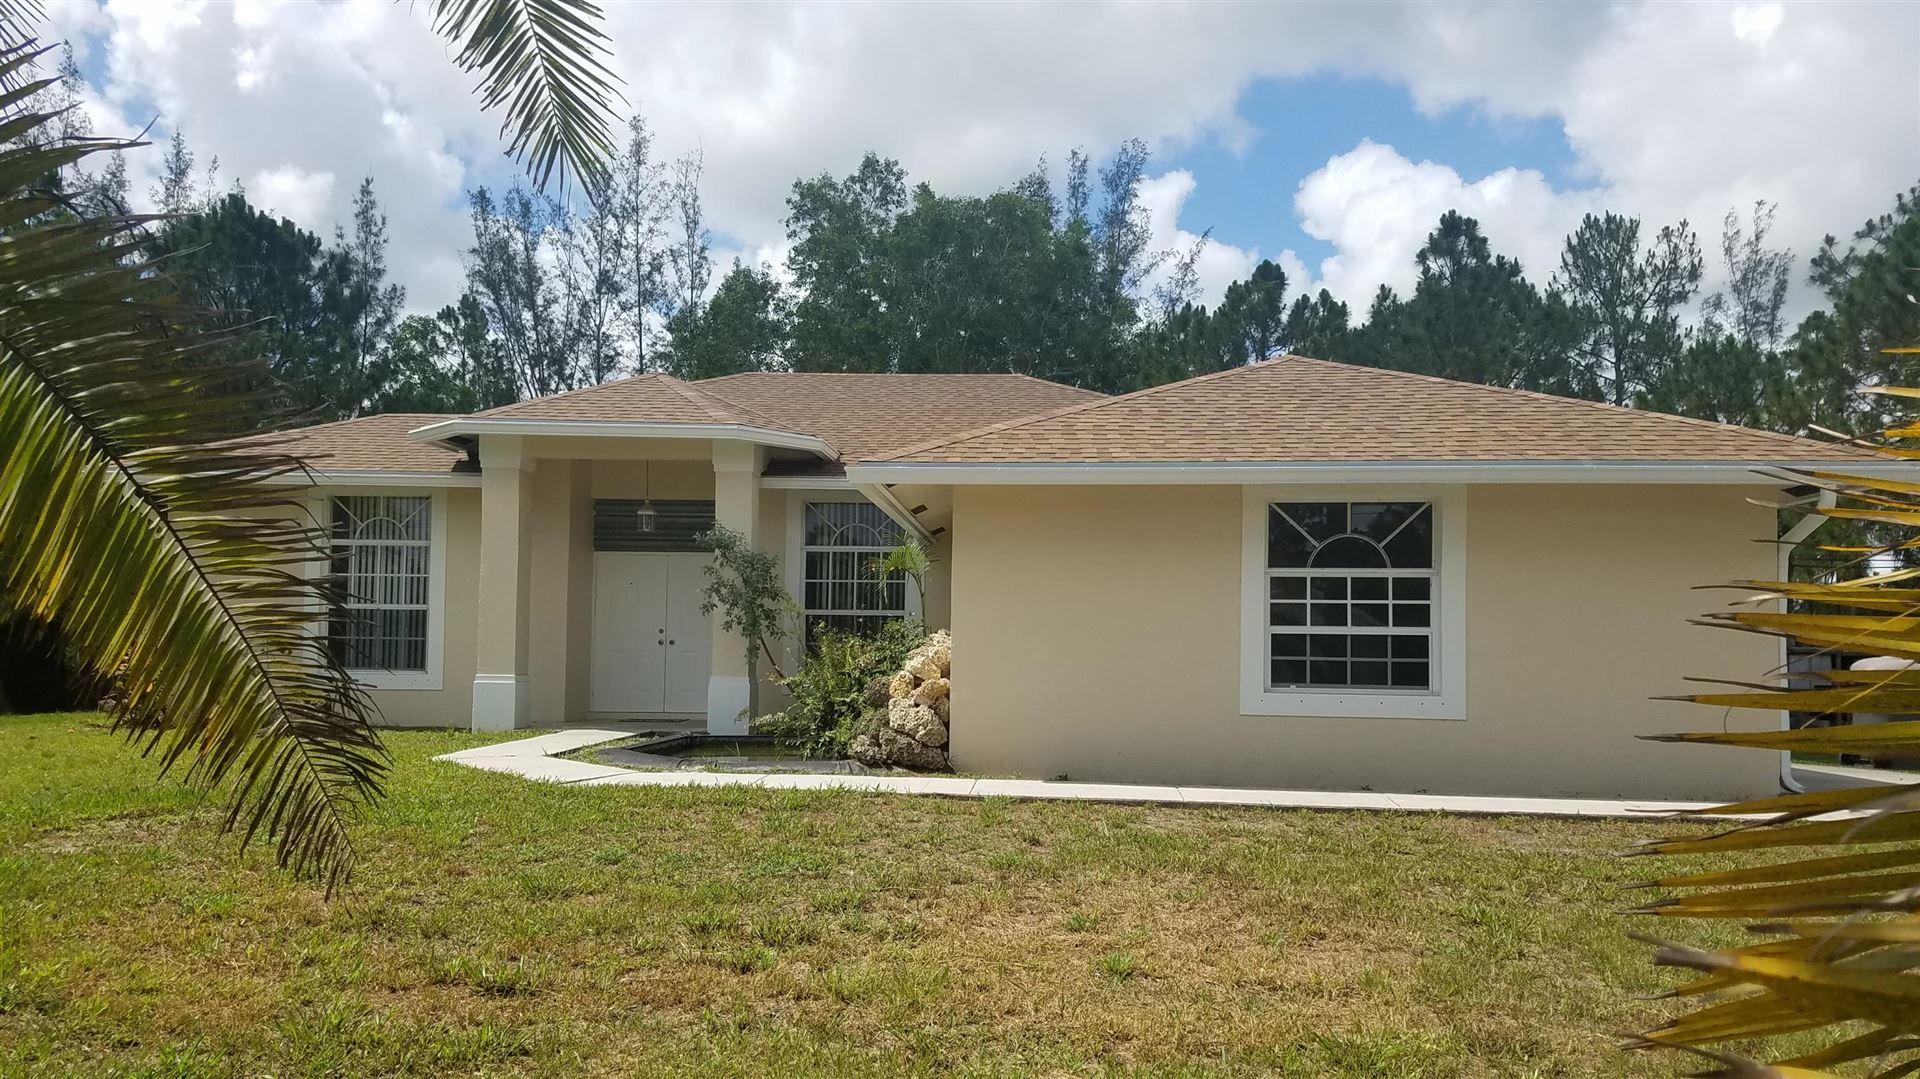 15782 N 92nd Court N, West Palm Beach, FL 33412 - #: RX-10721186